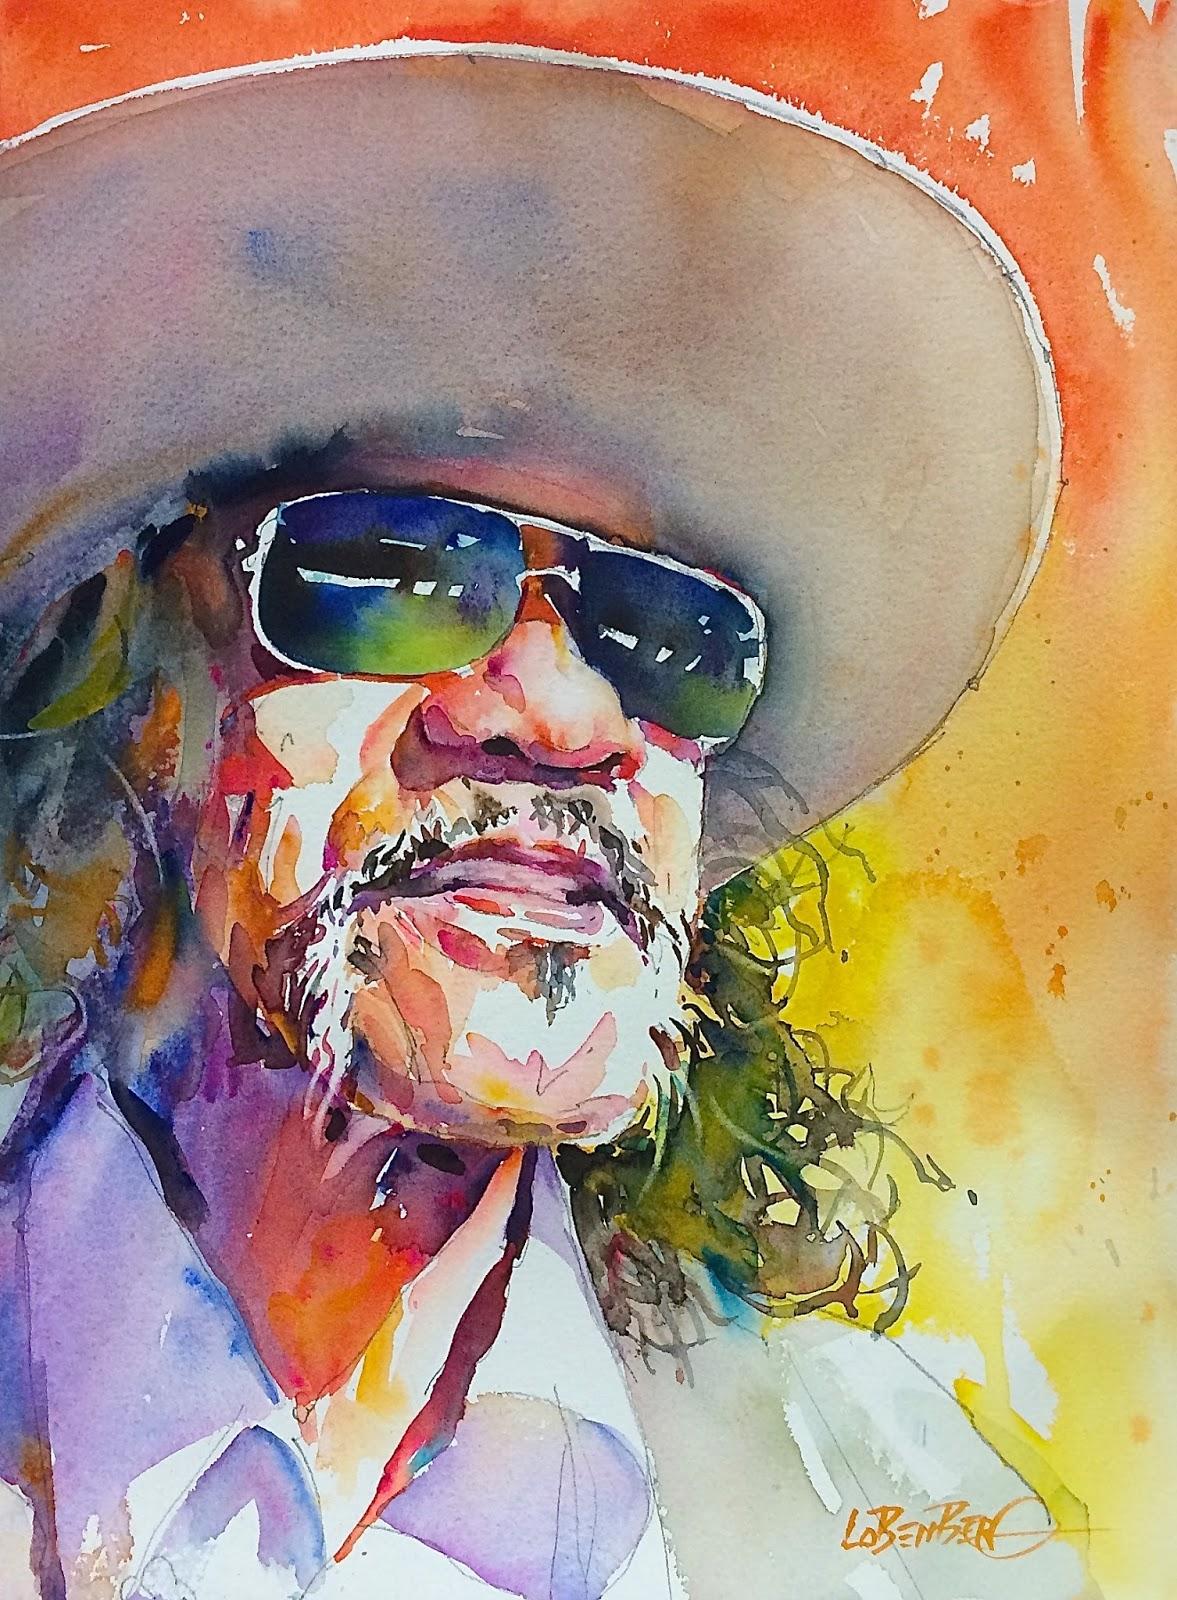 david lobenberg musico mexicano watercolor step by step